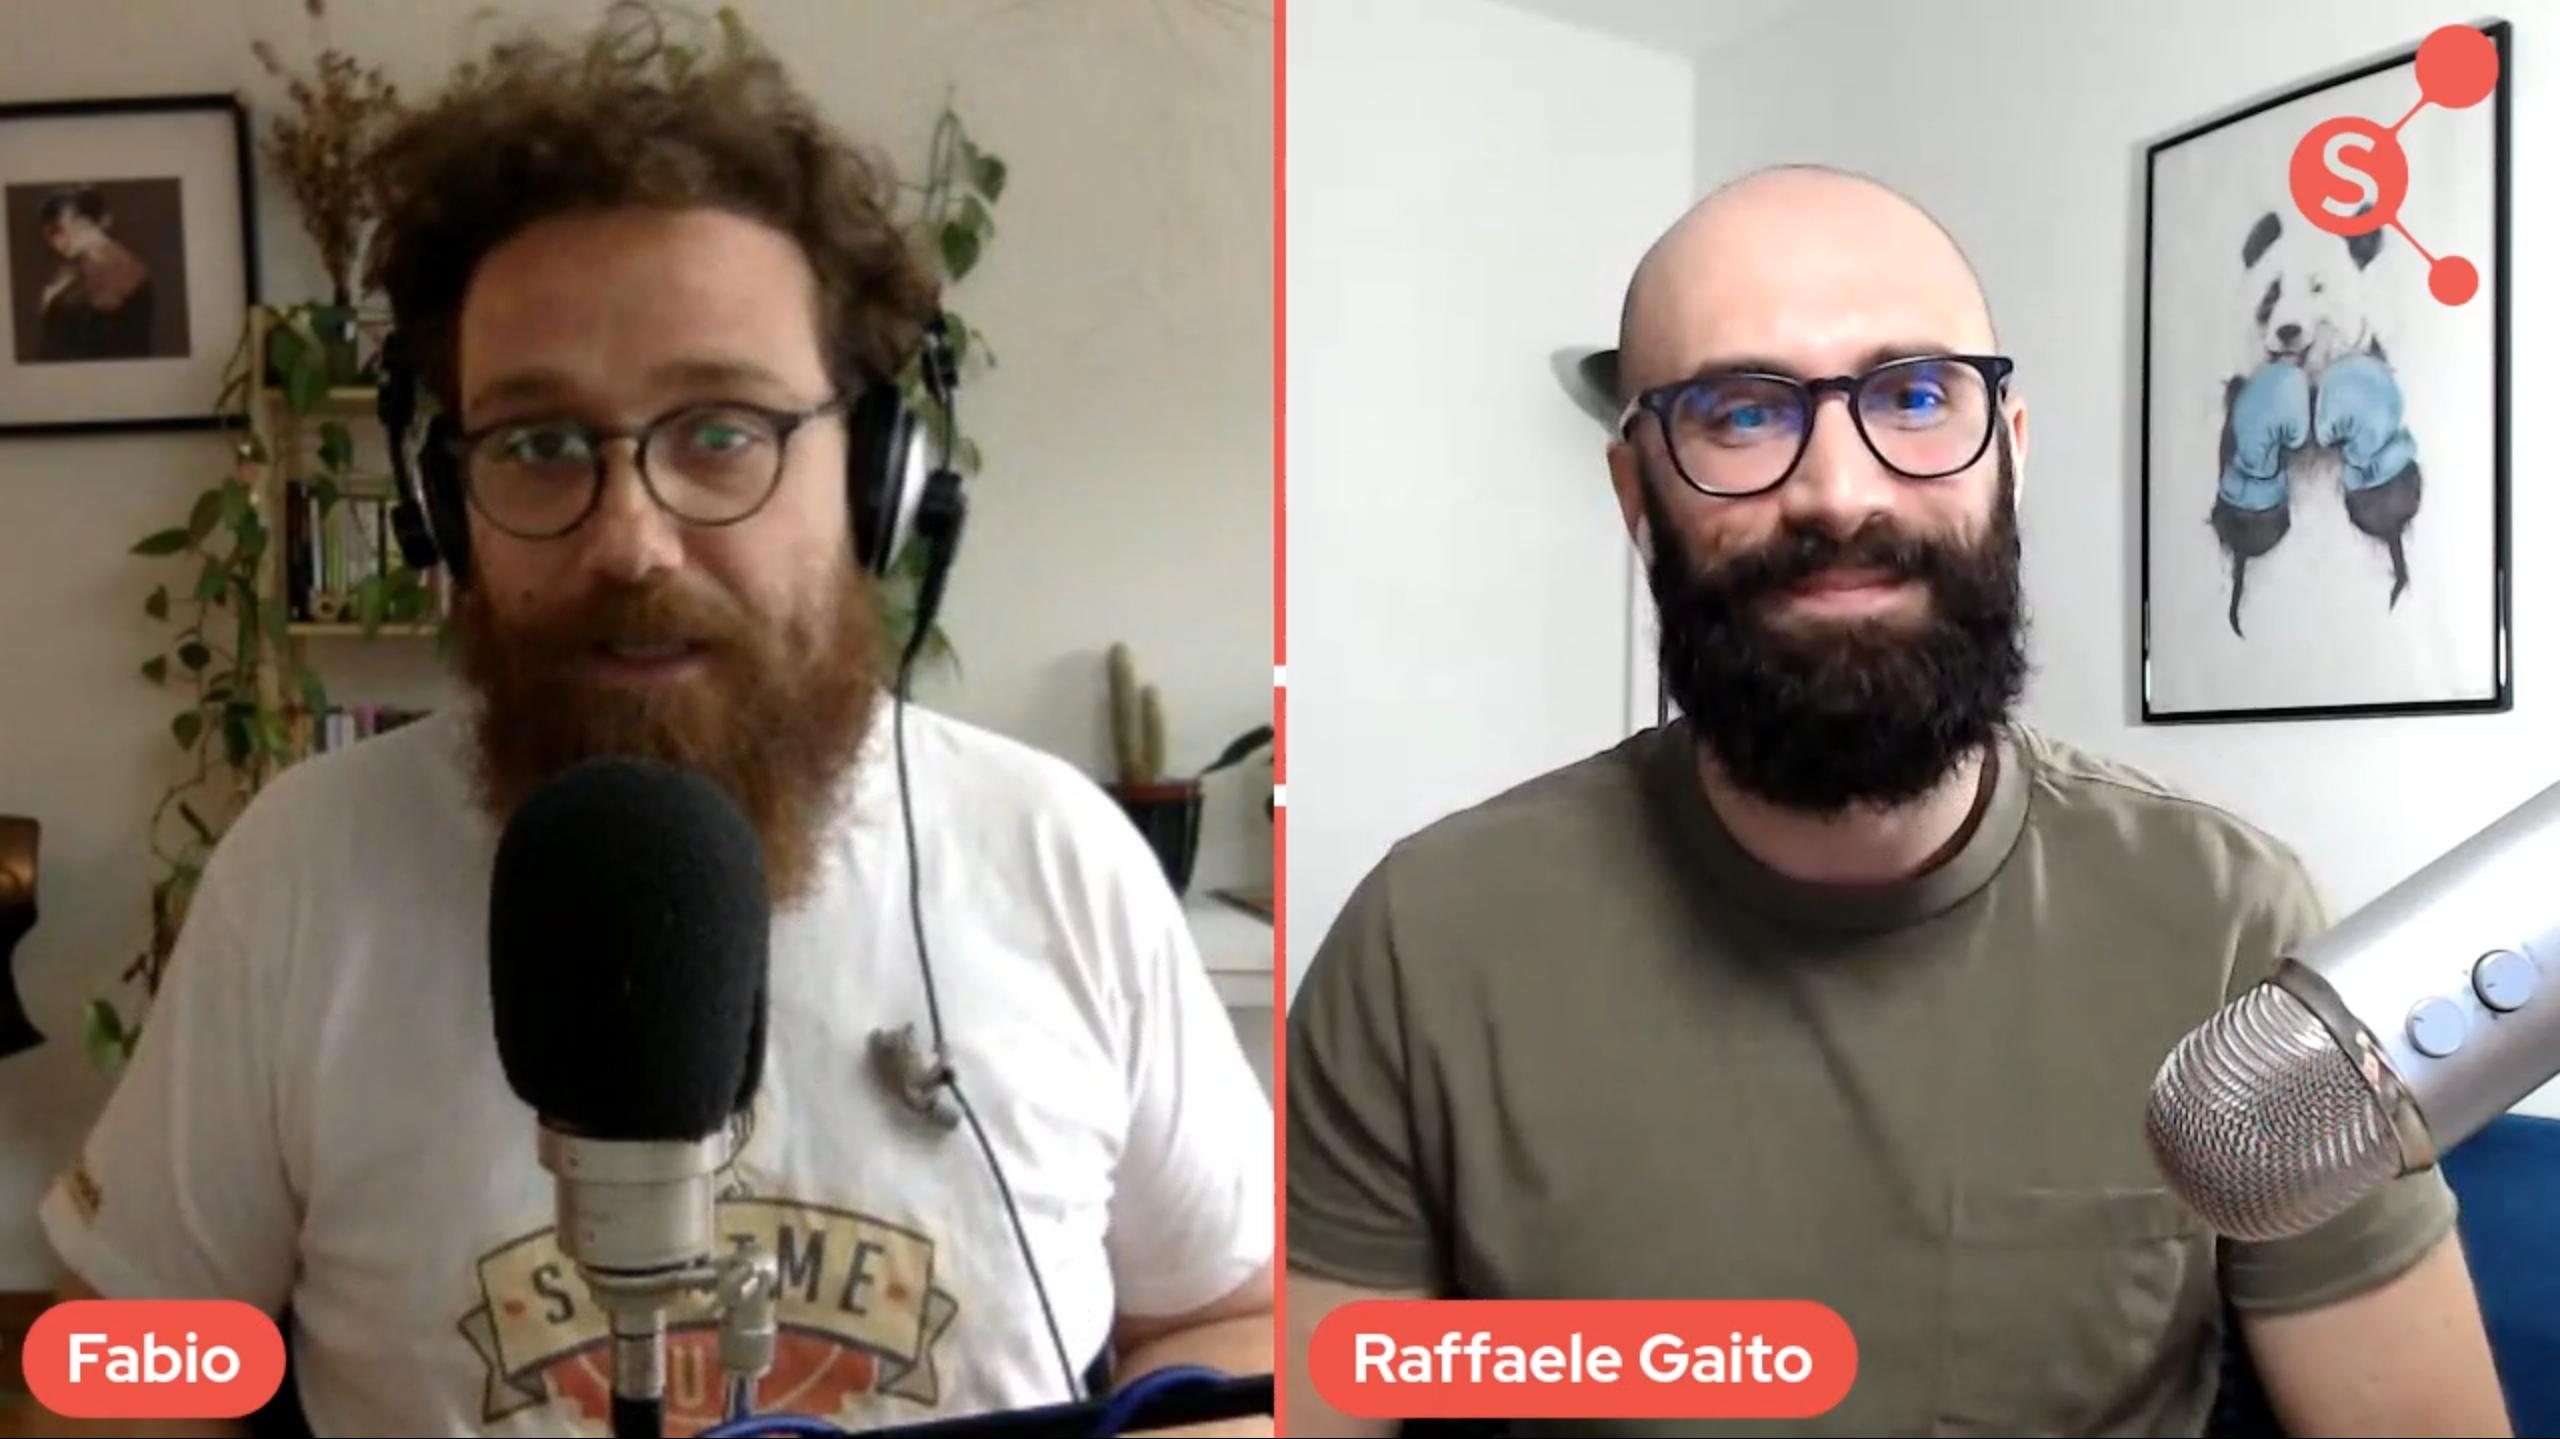 Raffaele Gaito - growth Hacking - interviste di Spidwit